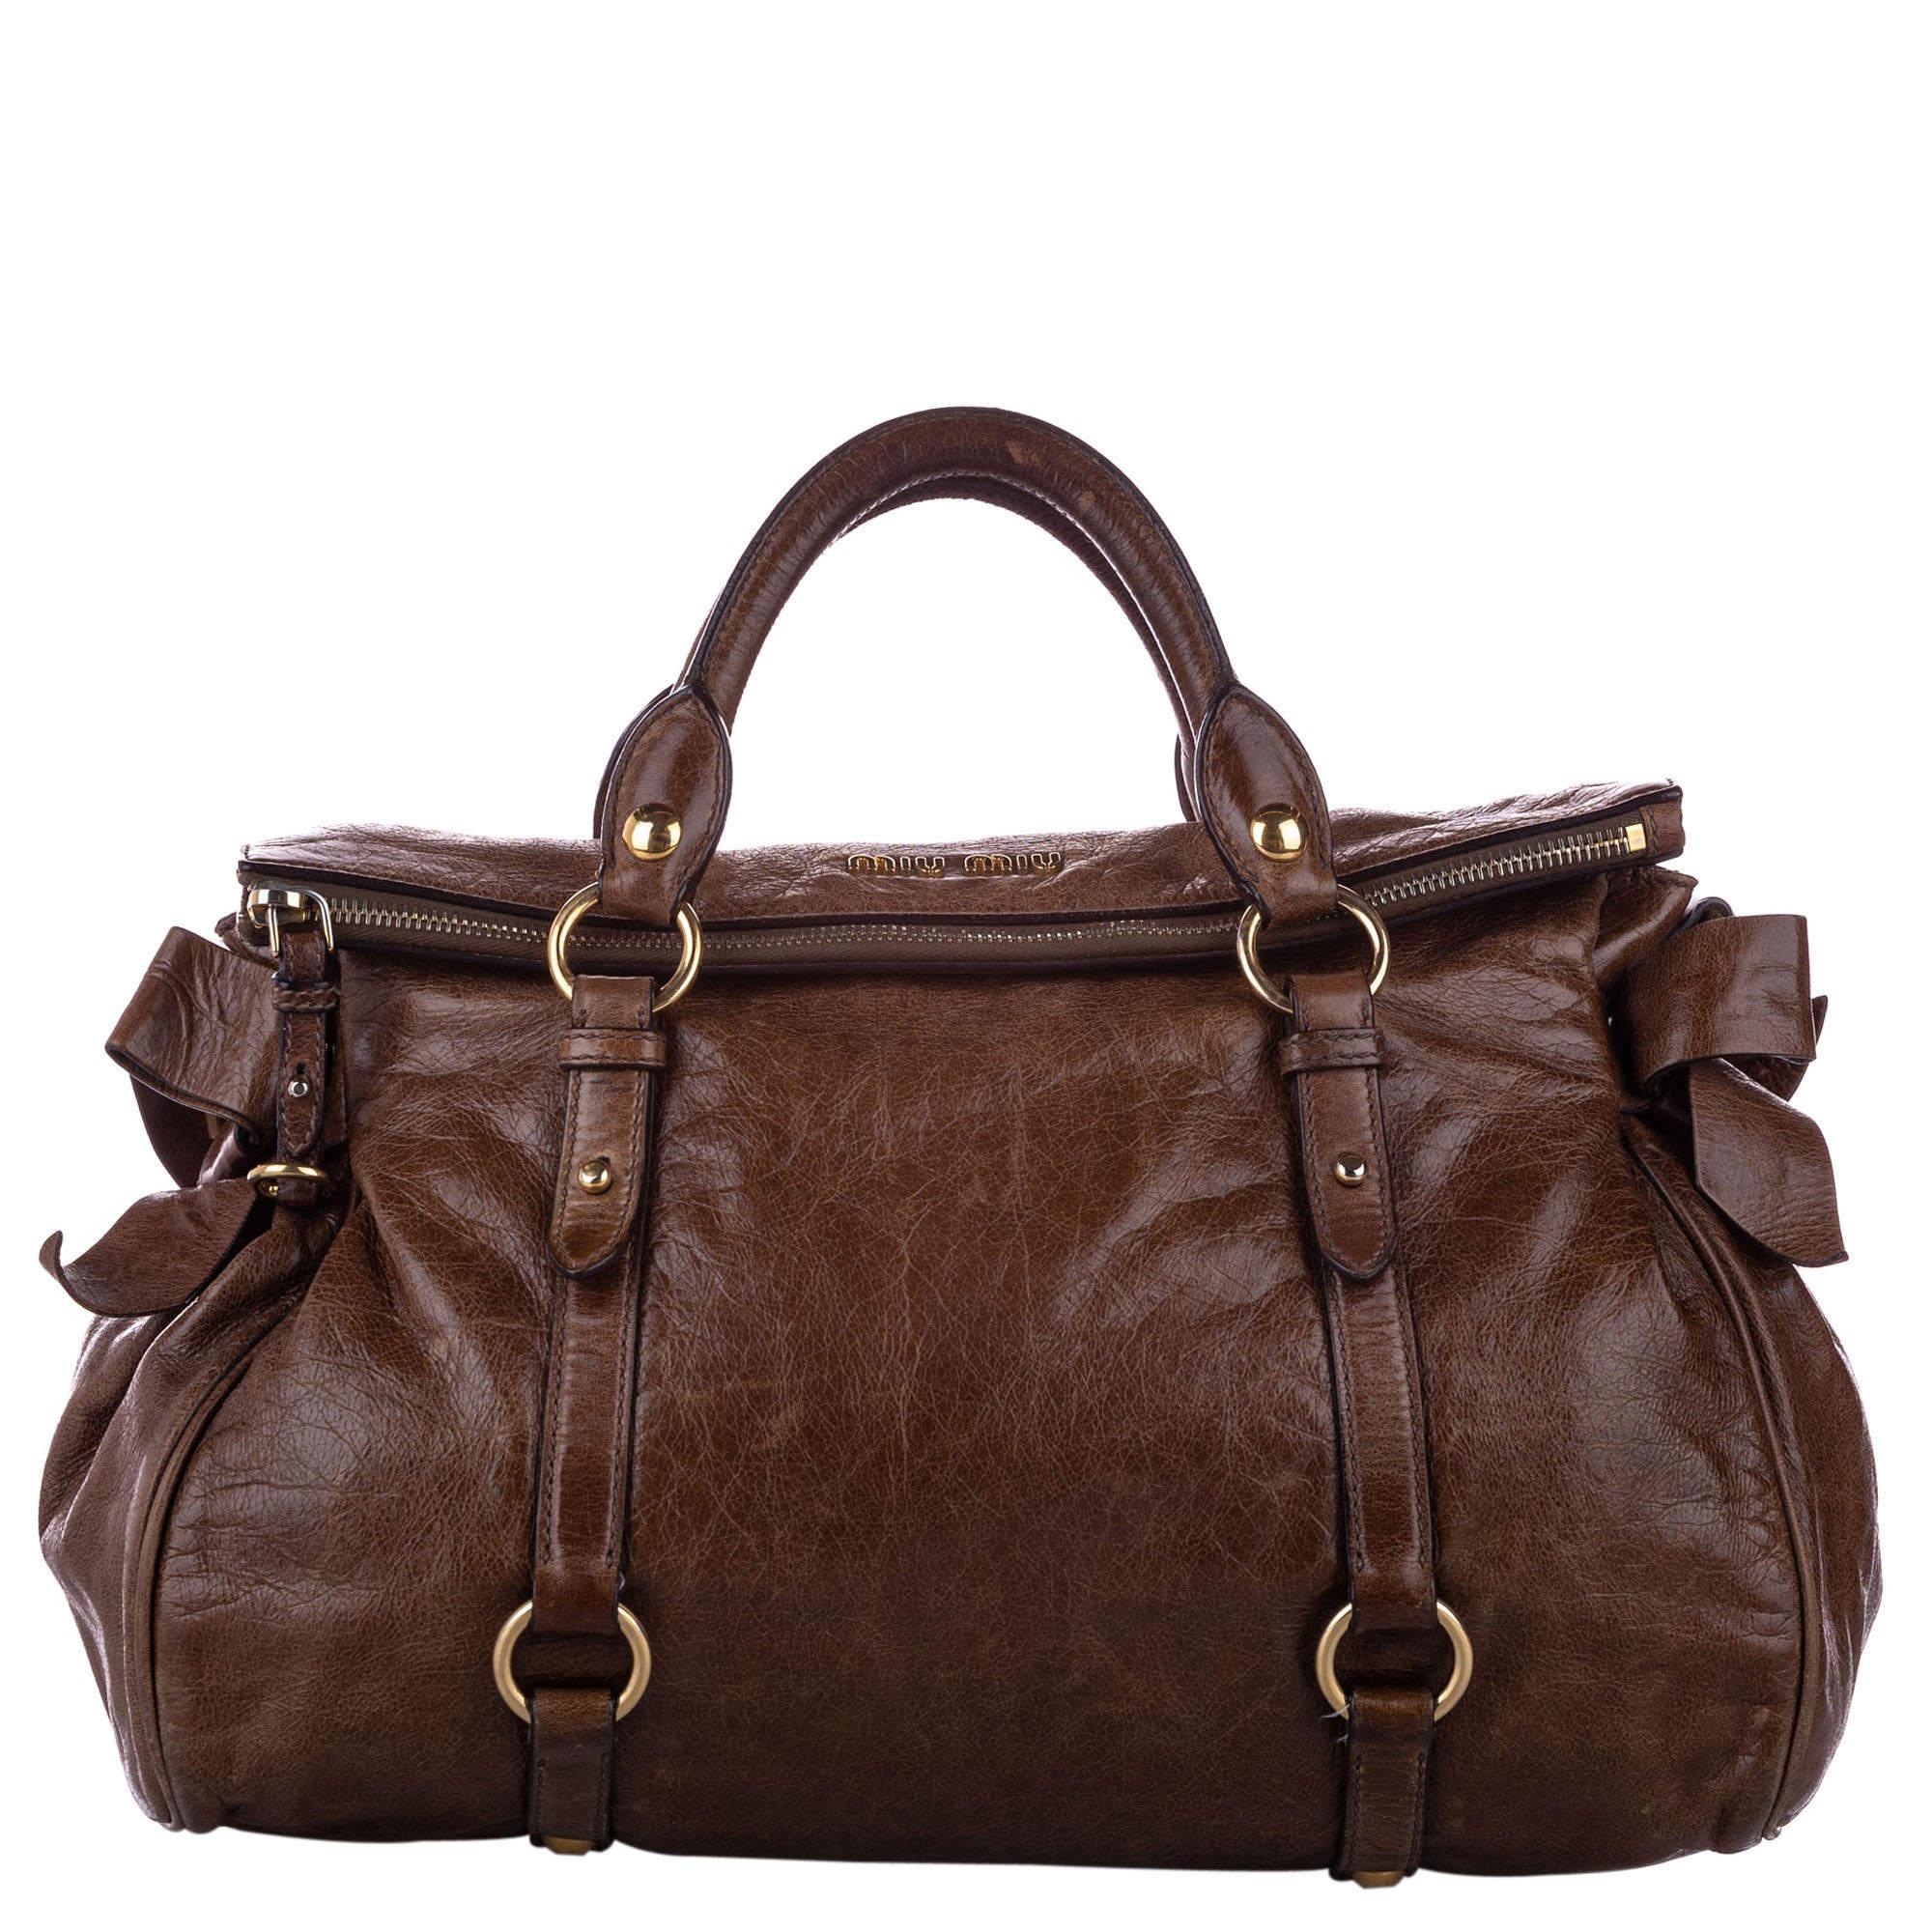 Miu Miu Brown Leather Vitello Lux Bow Satchel Bag